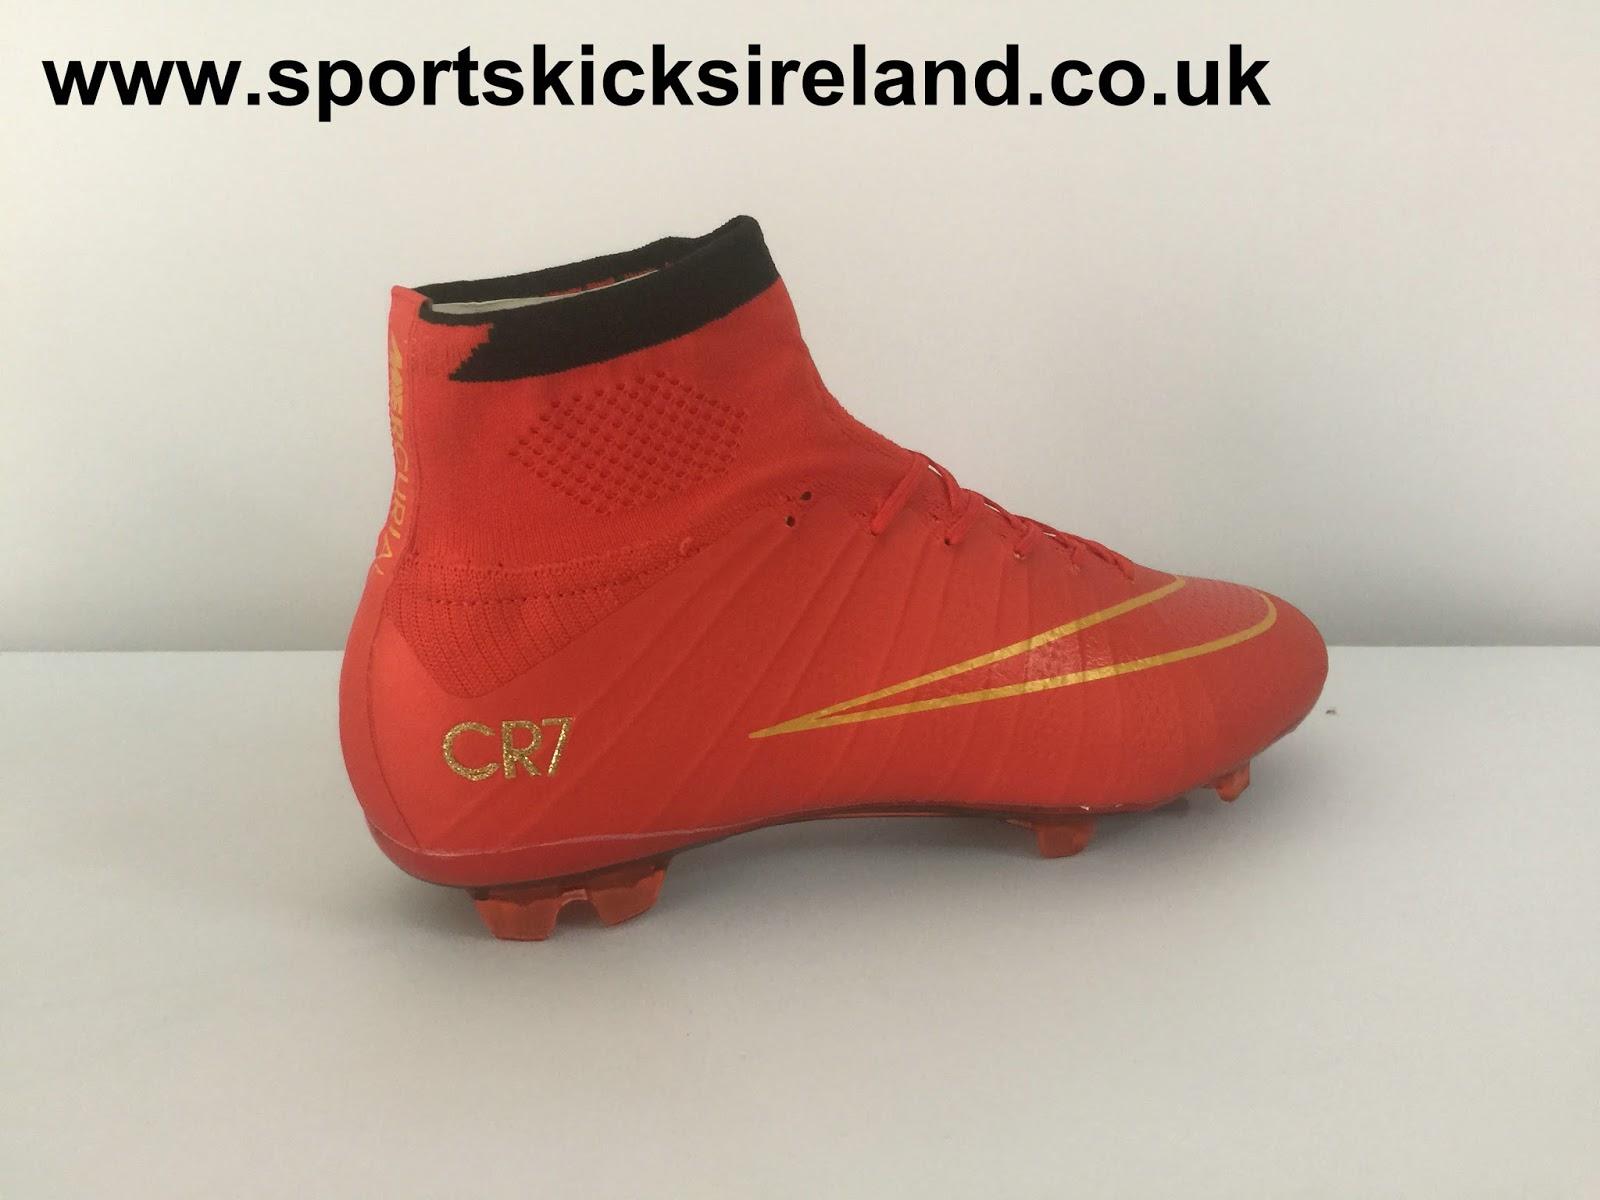 newest e7980 ecf8c Sports Kicks Ireland: All-new design of NIKE MERCURIAL ...